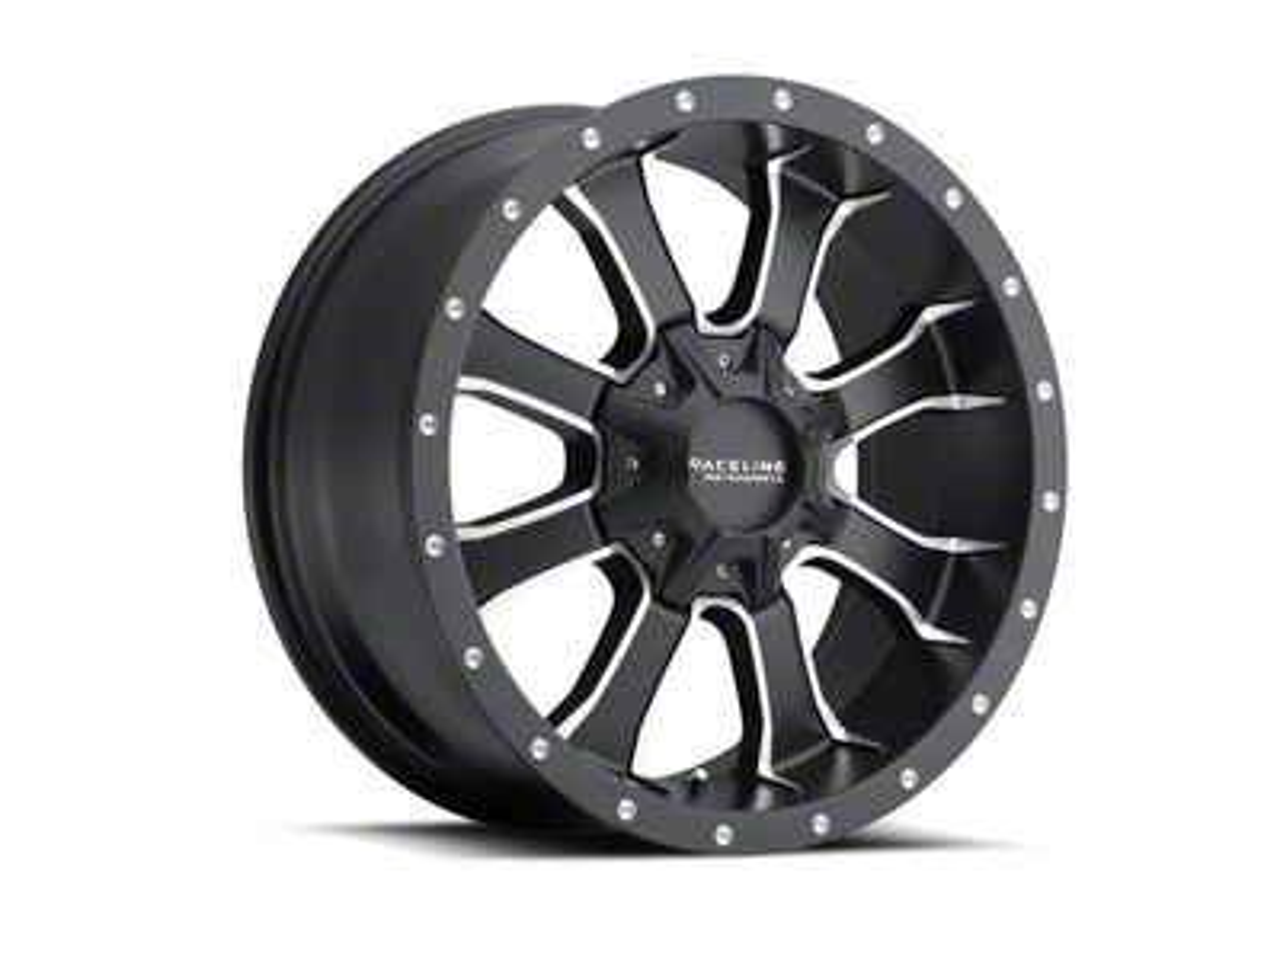 Raceline Mamba Black Wheel - 20x9 (18-19 Jeep Wrangler JL)